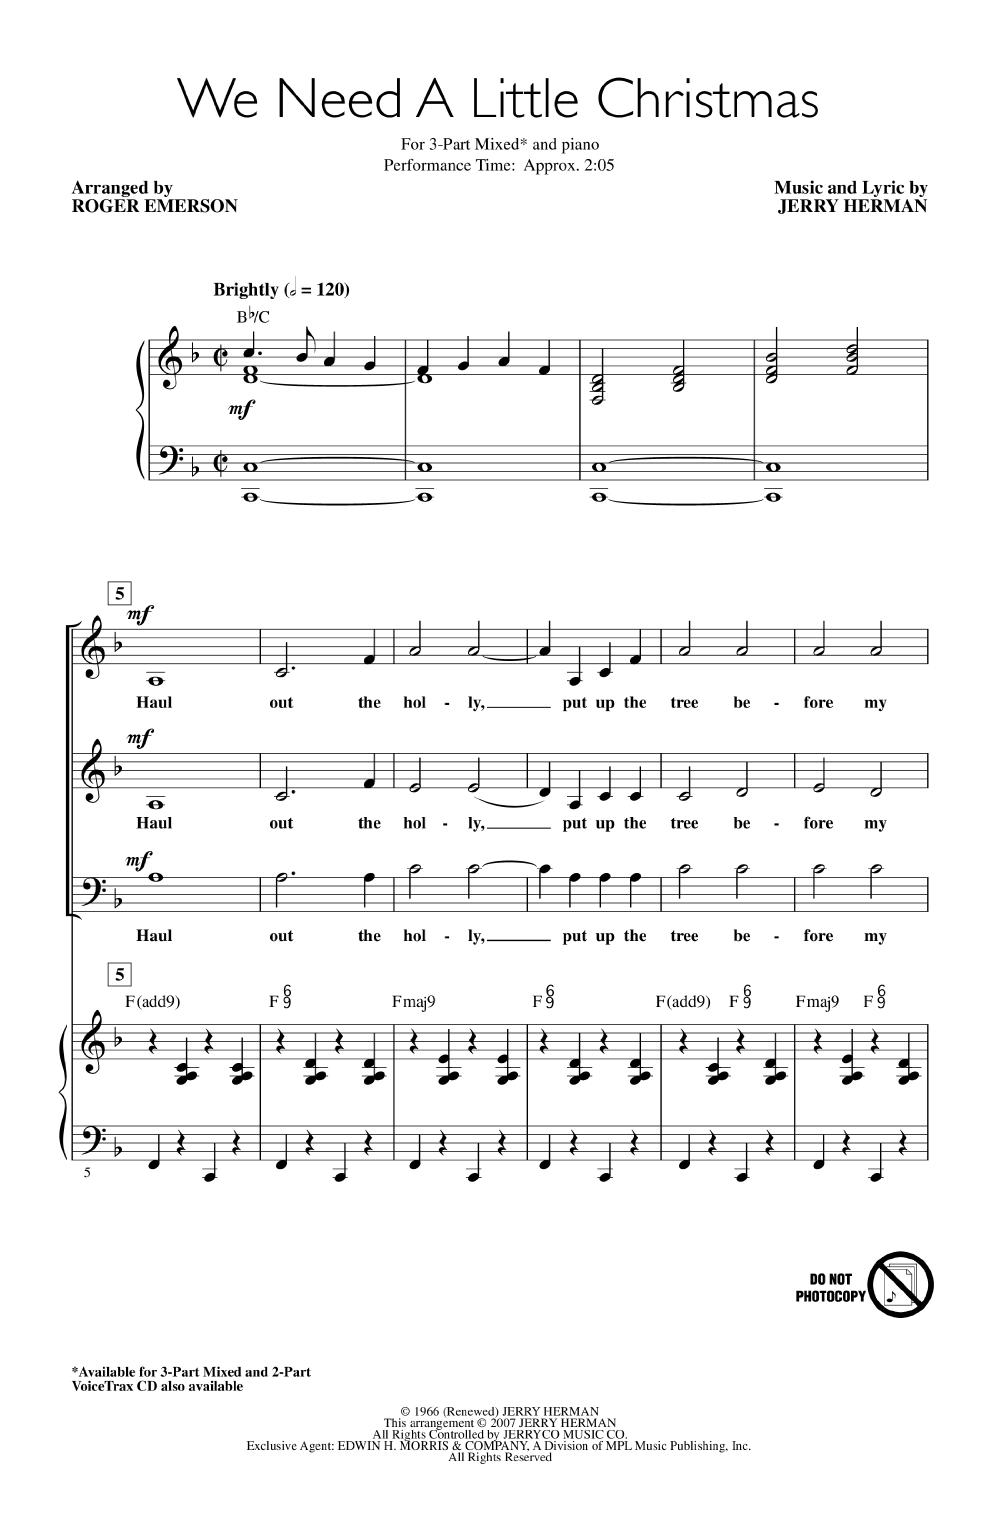 We Need a Little Christmas (ThreePart Mixed J.W. Pepper